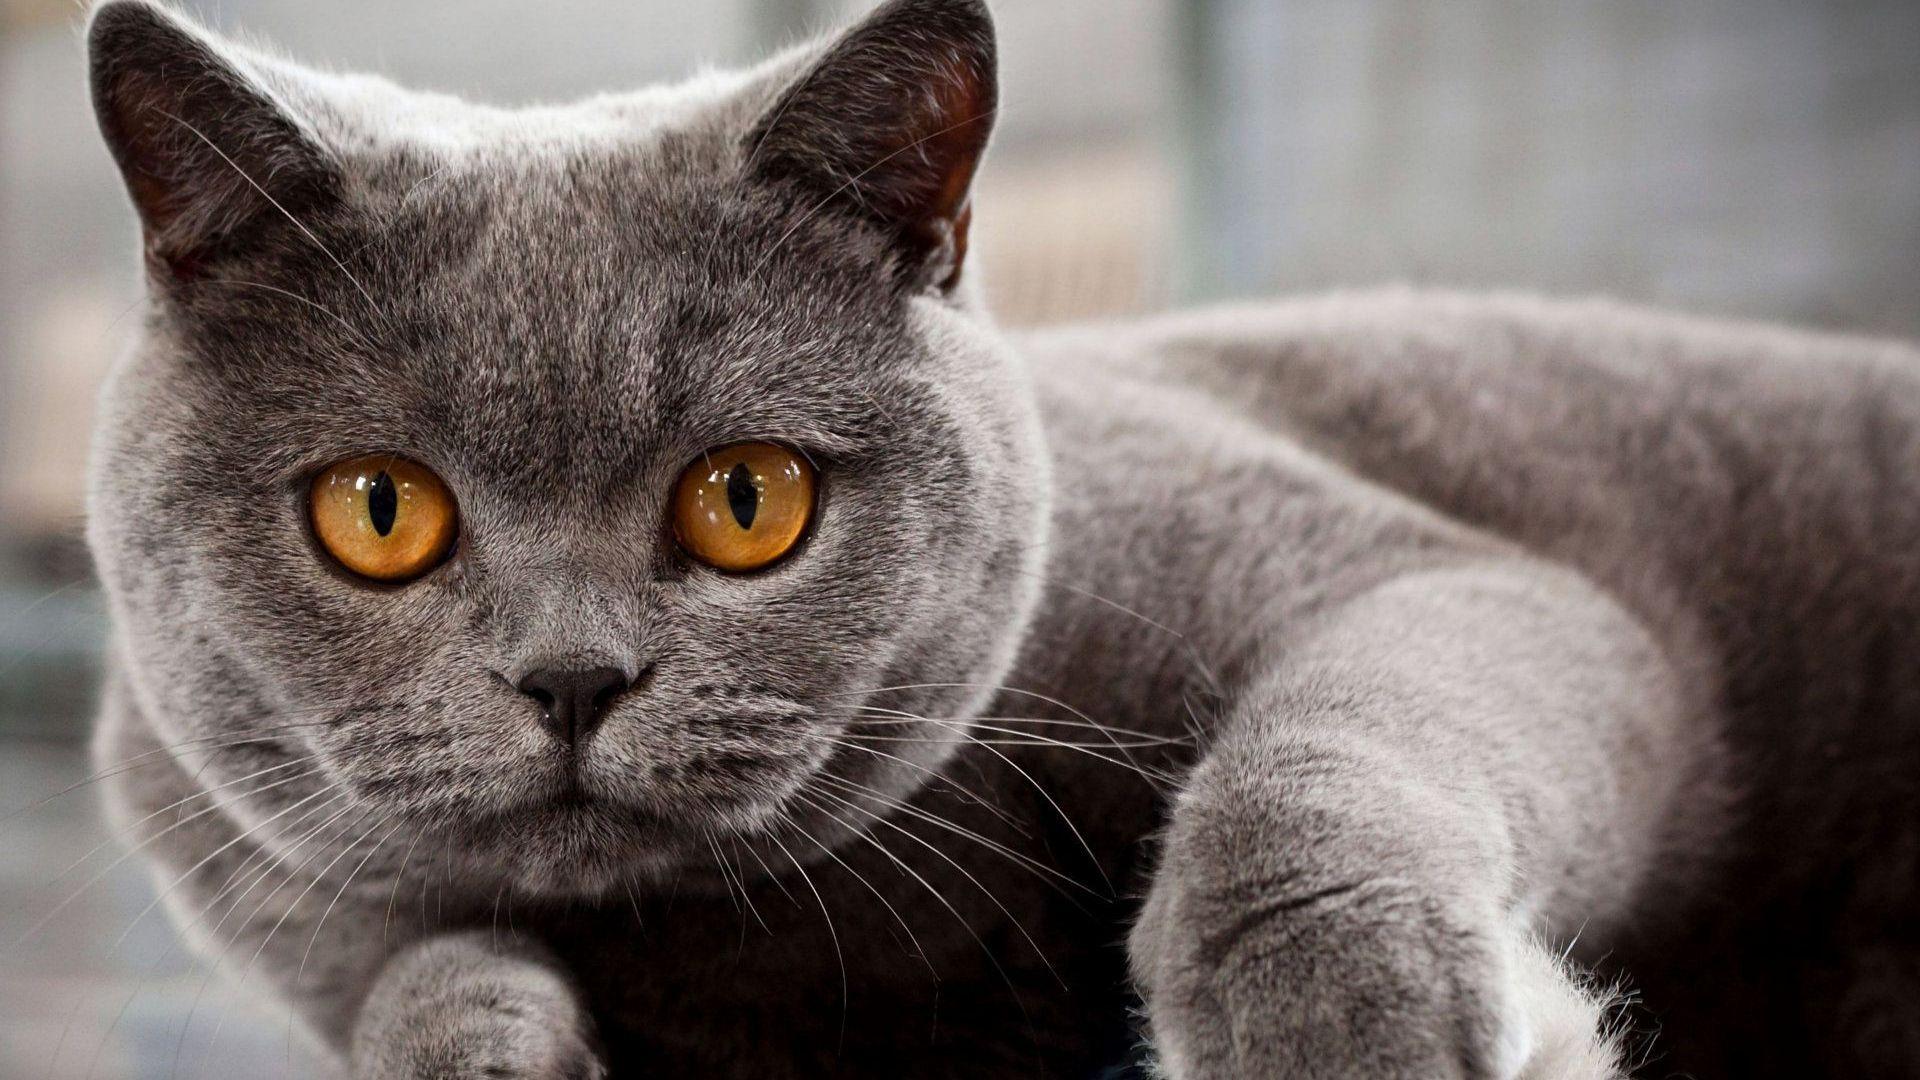 Maano waiting for Milk Best cat litter, Cat lovers